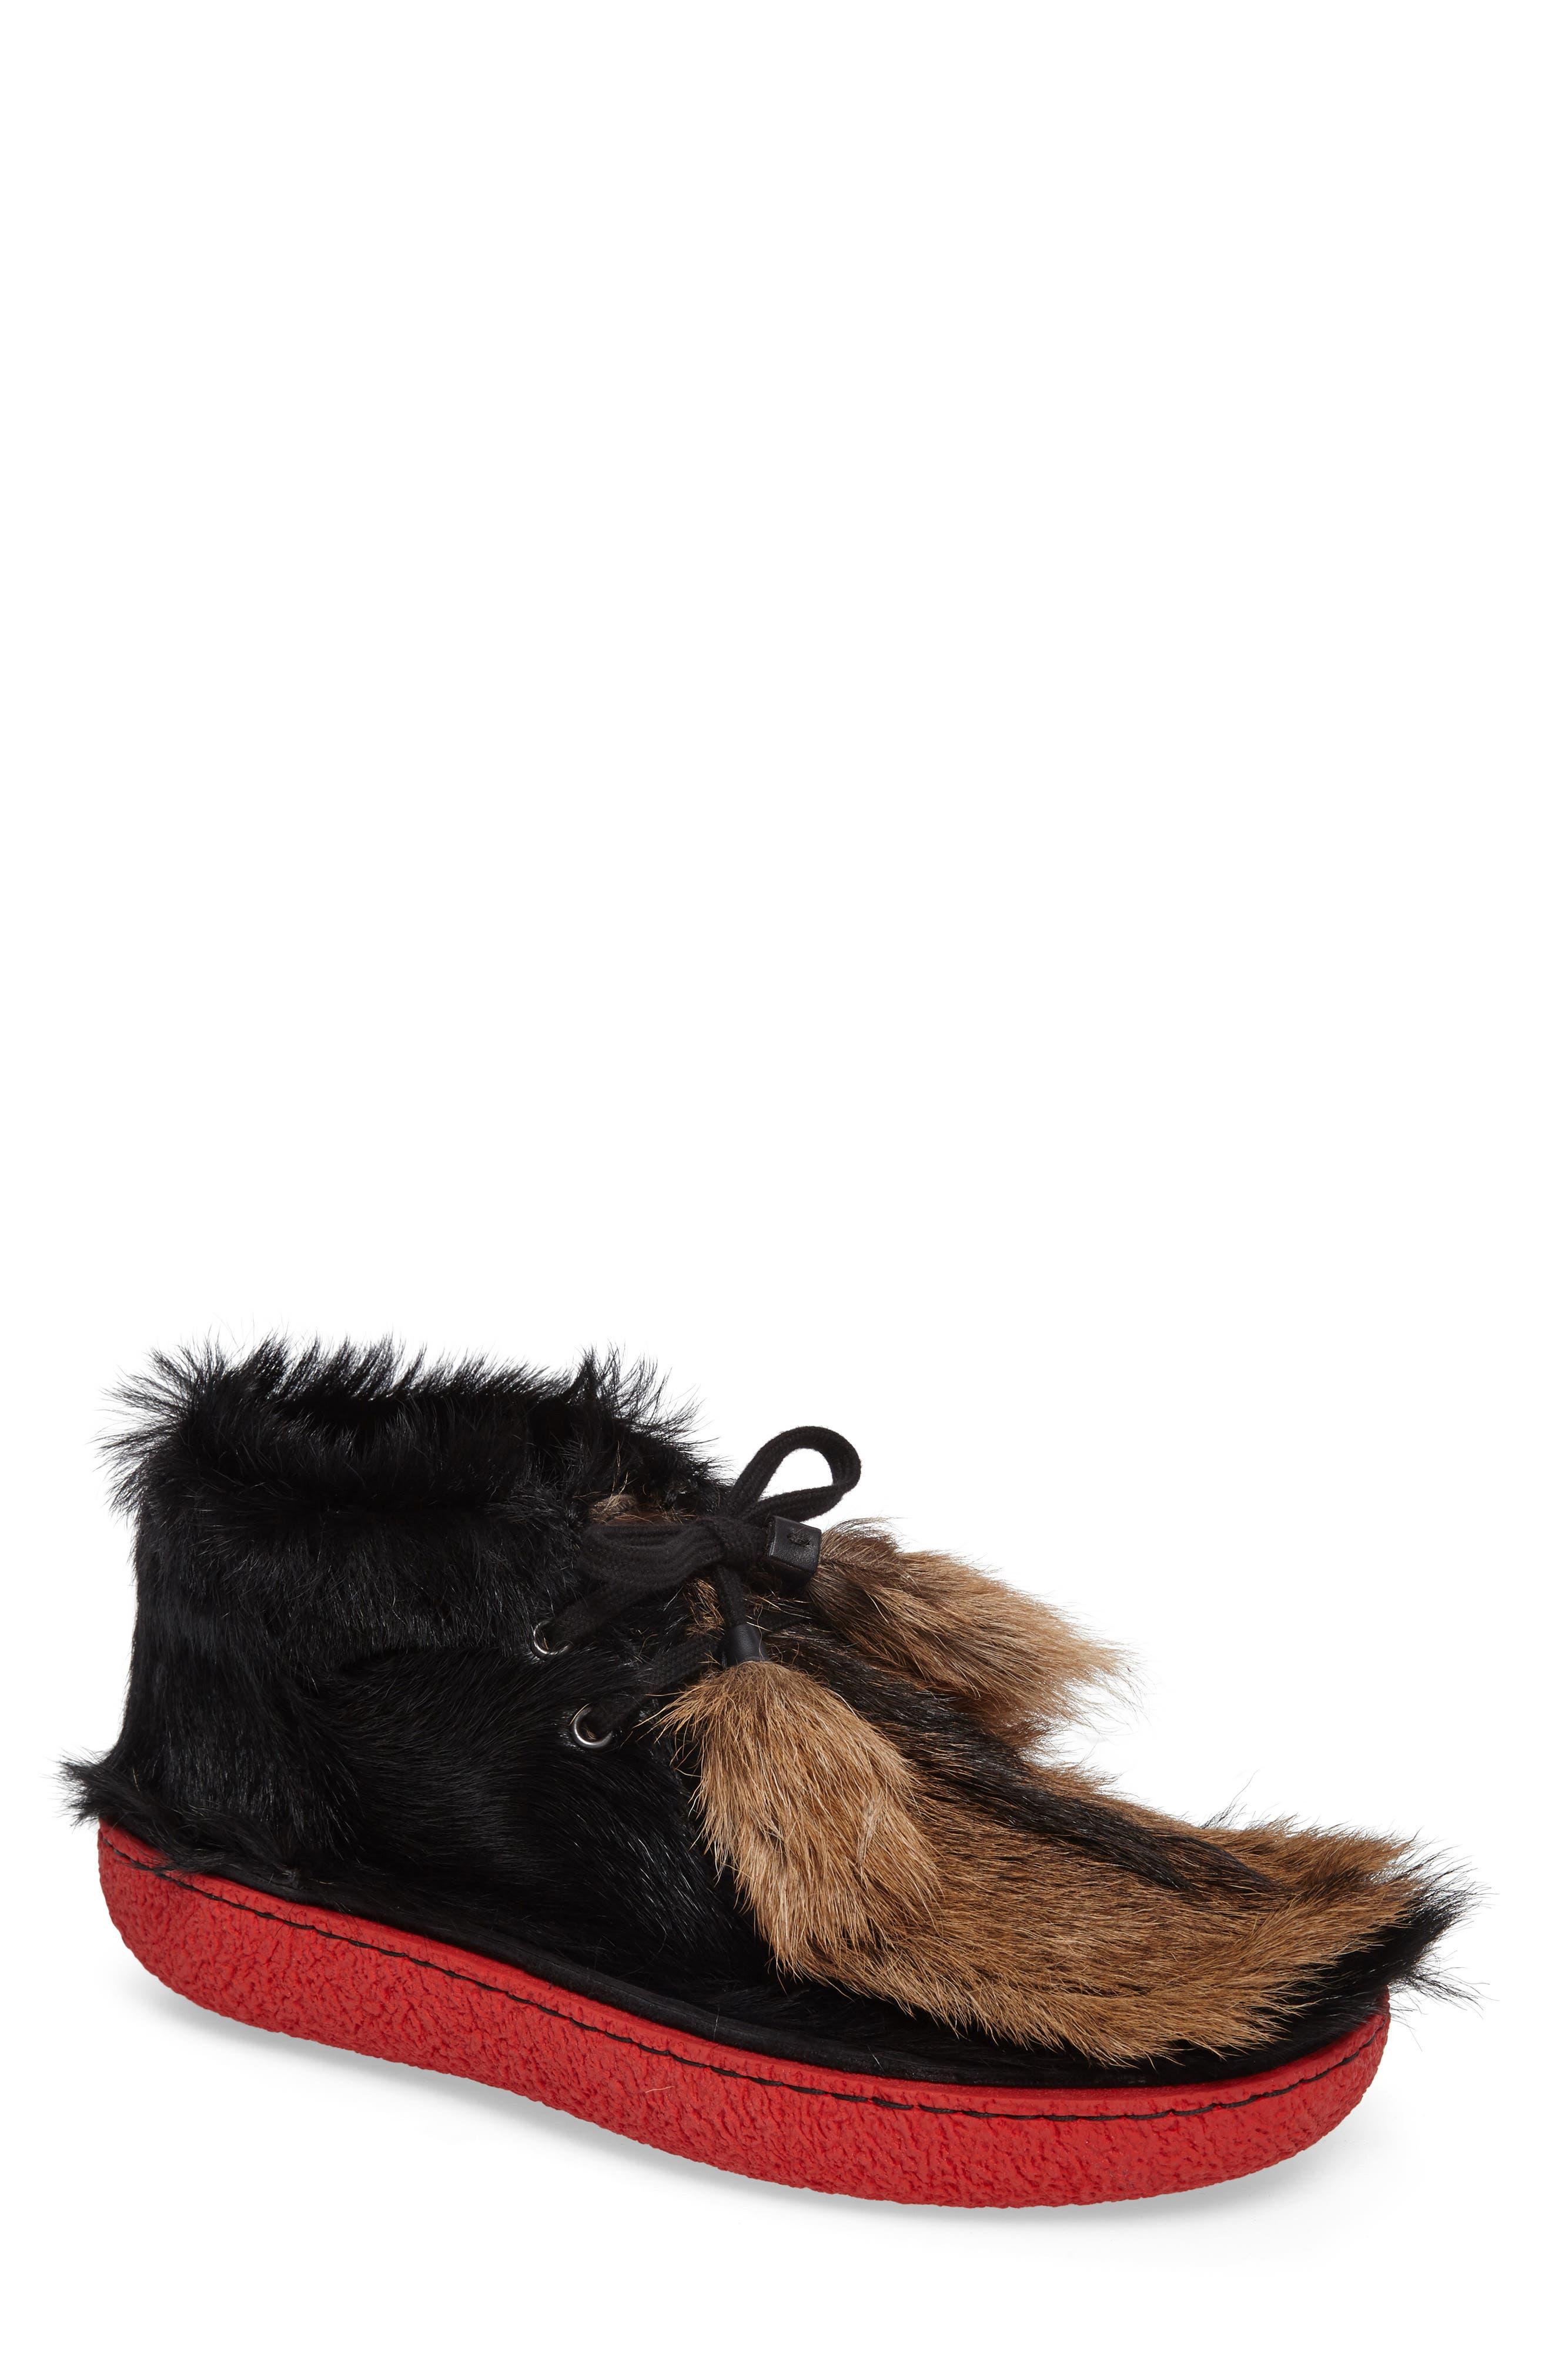 Genuine Calf and Goat Hair Chukka Boot,                         Main,                         color, Nero Multi